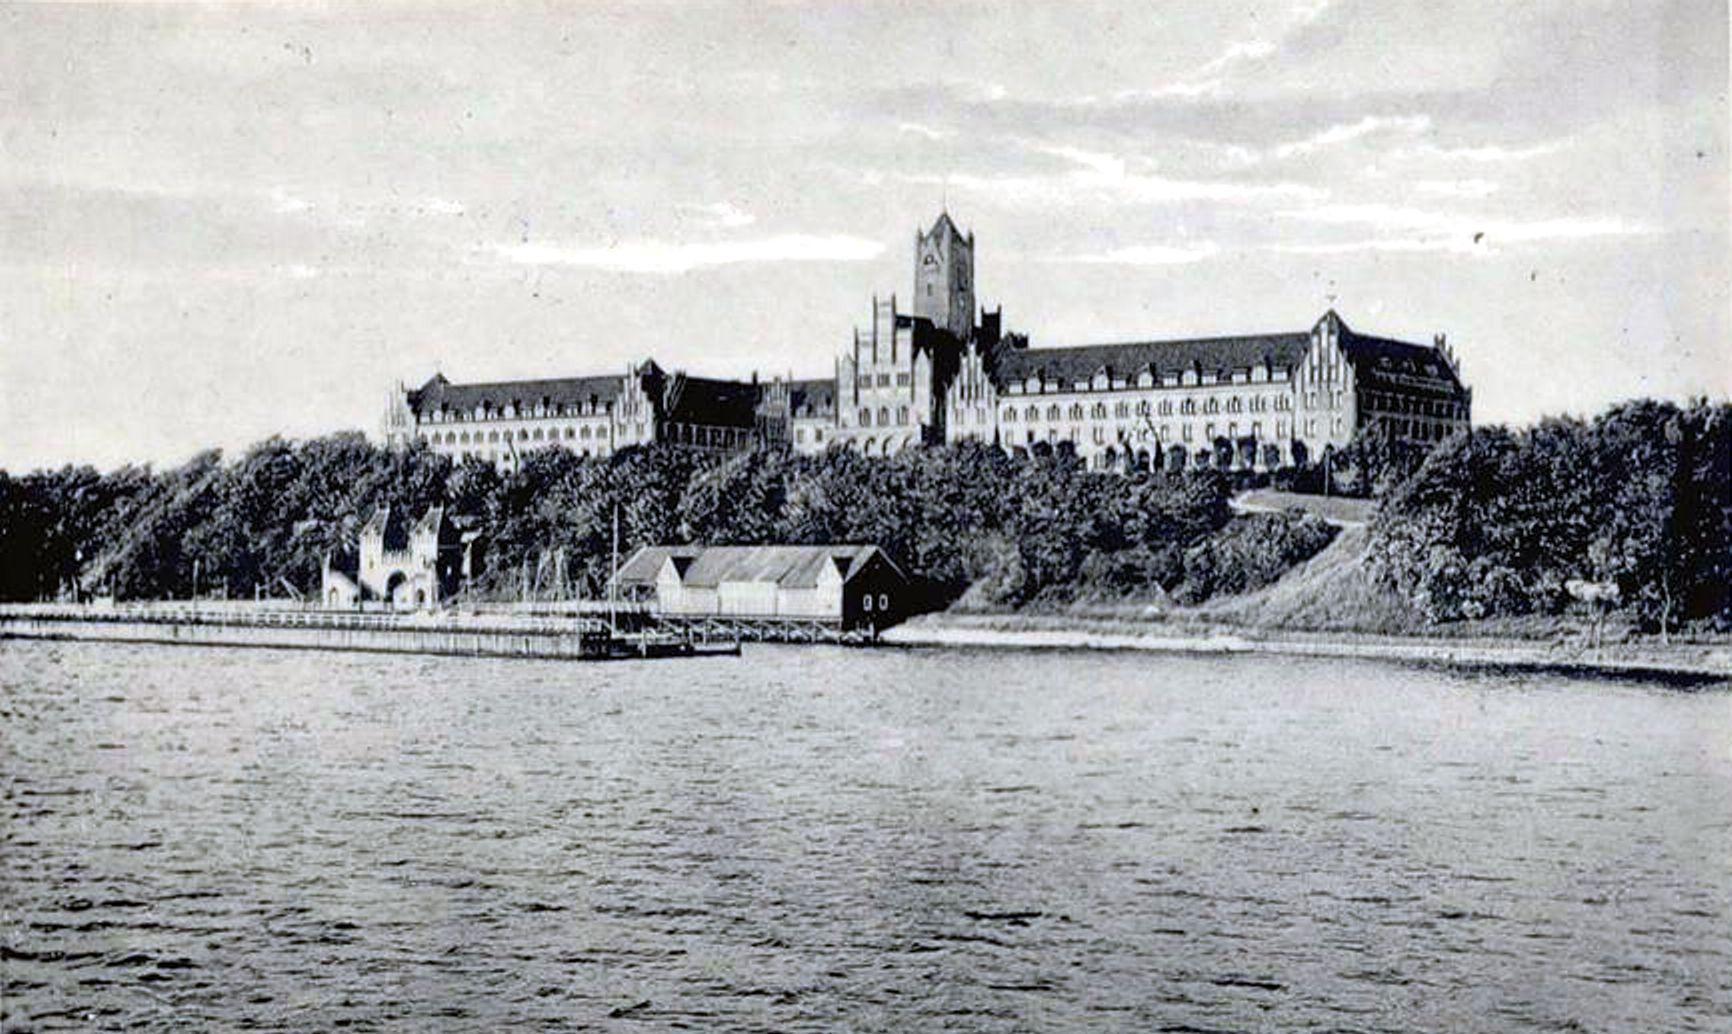 http://de.metapedia.org/m/images/7/7d/Marineschule_Flensburg-M%C3%BCrwik.jpg